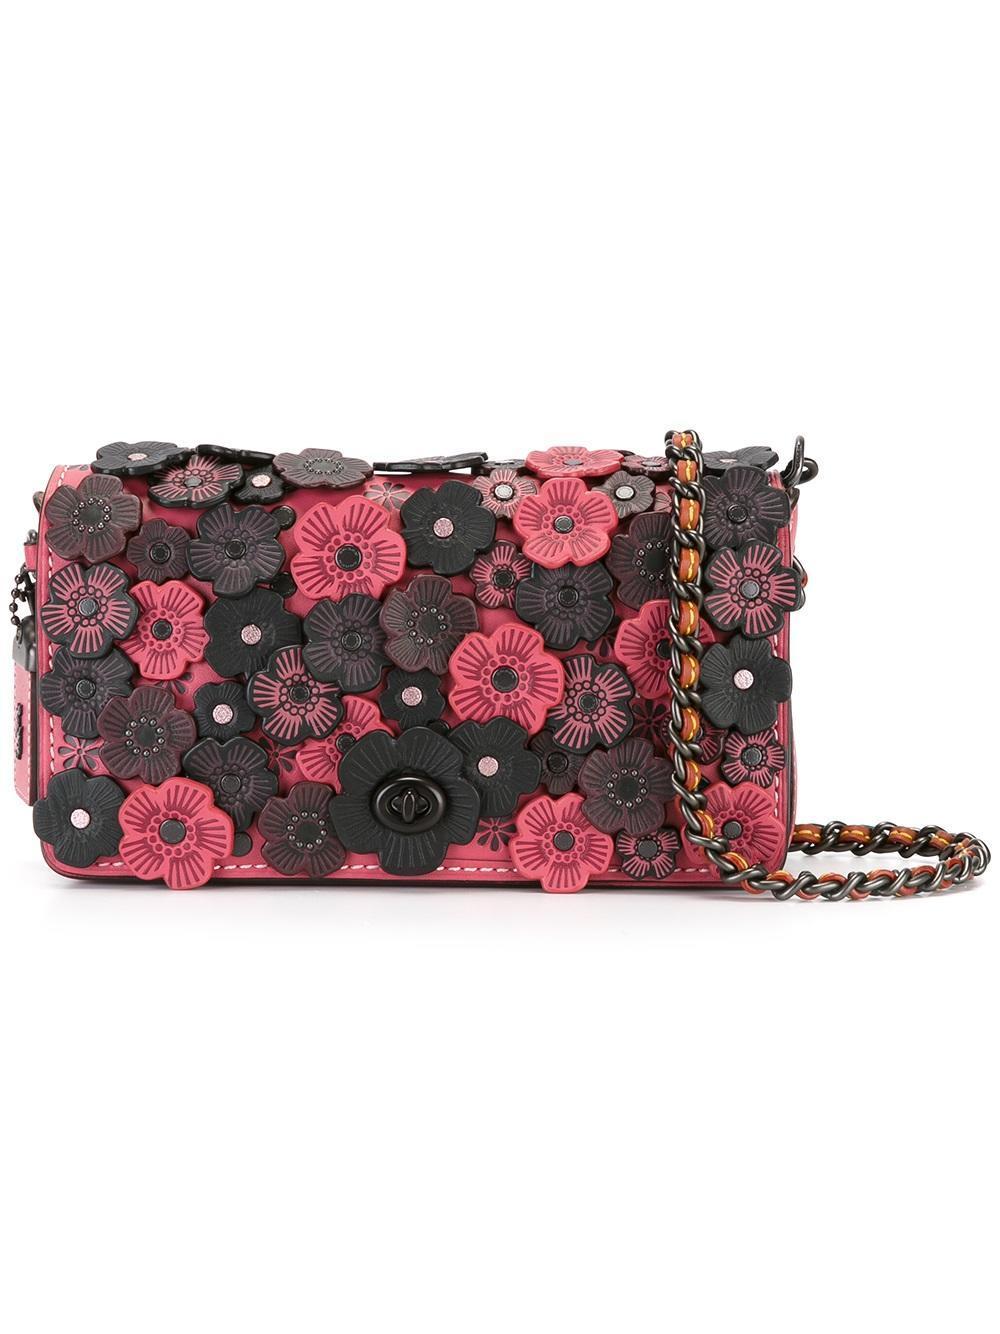 Lyst coach flower embellished crossbody bag in pink gallery mightylinksfo